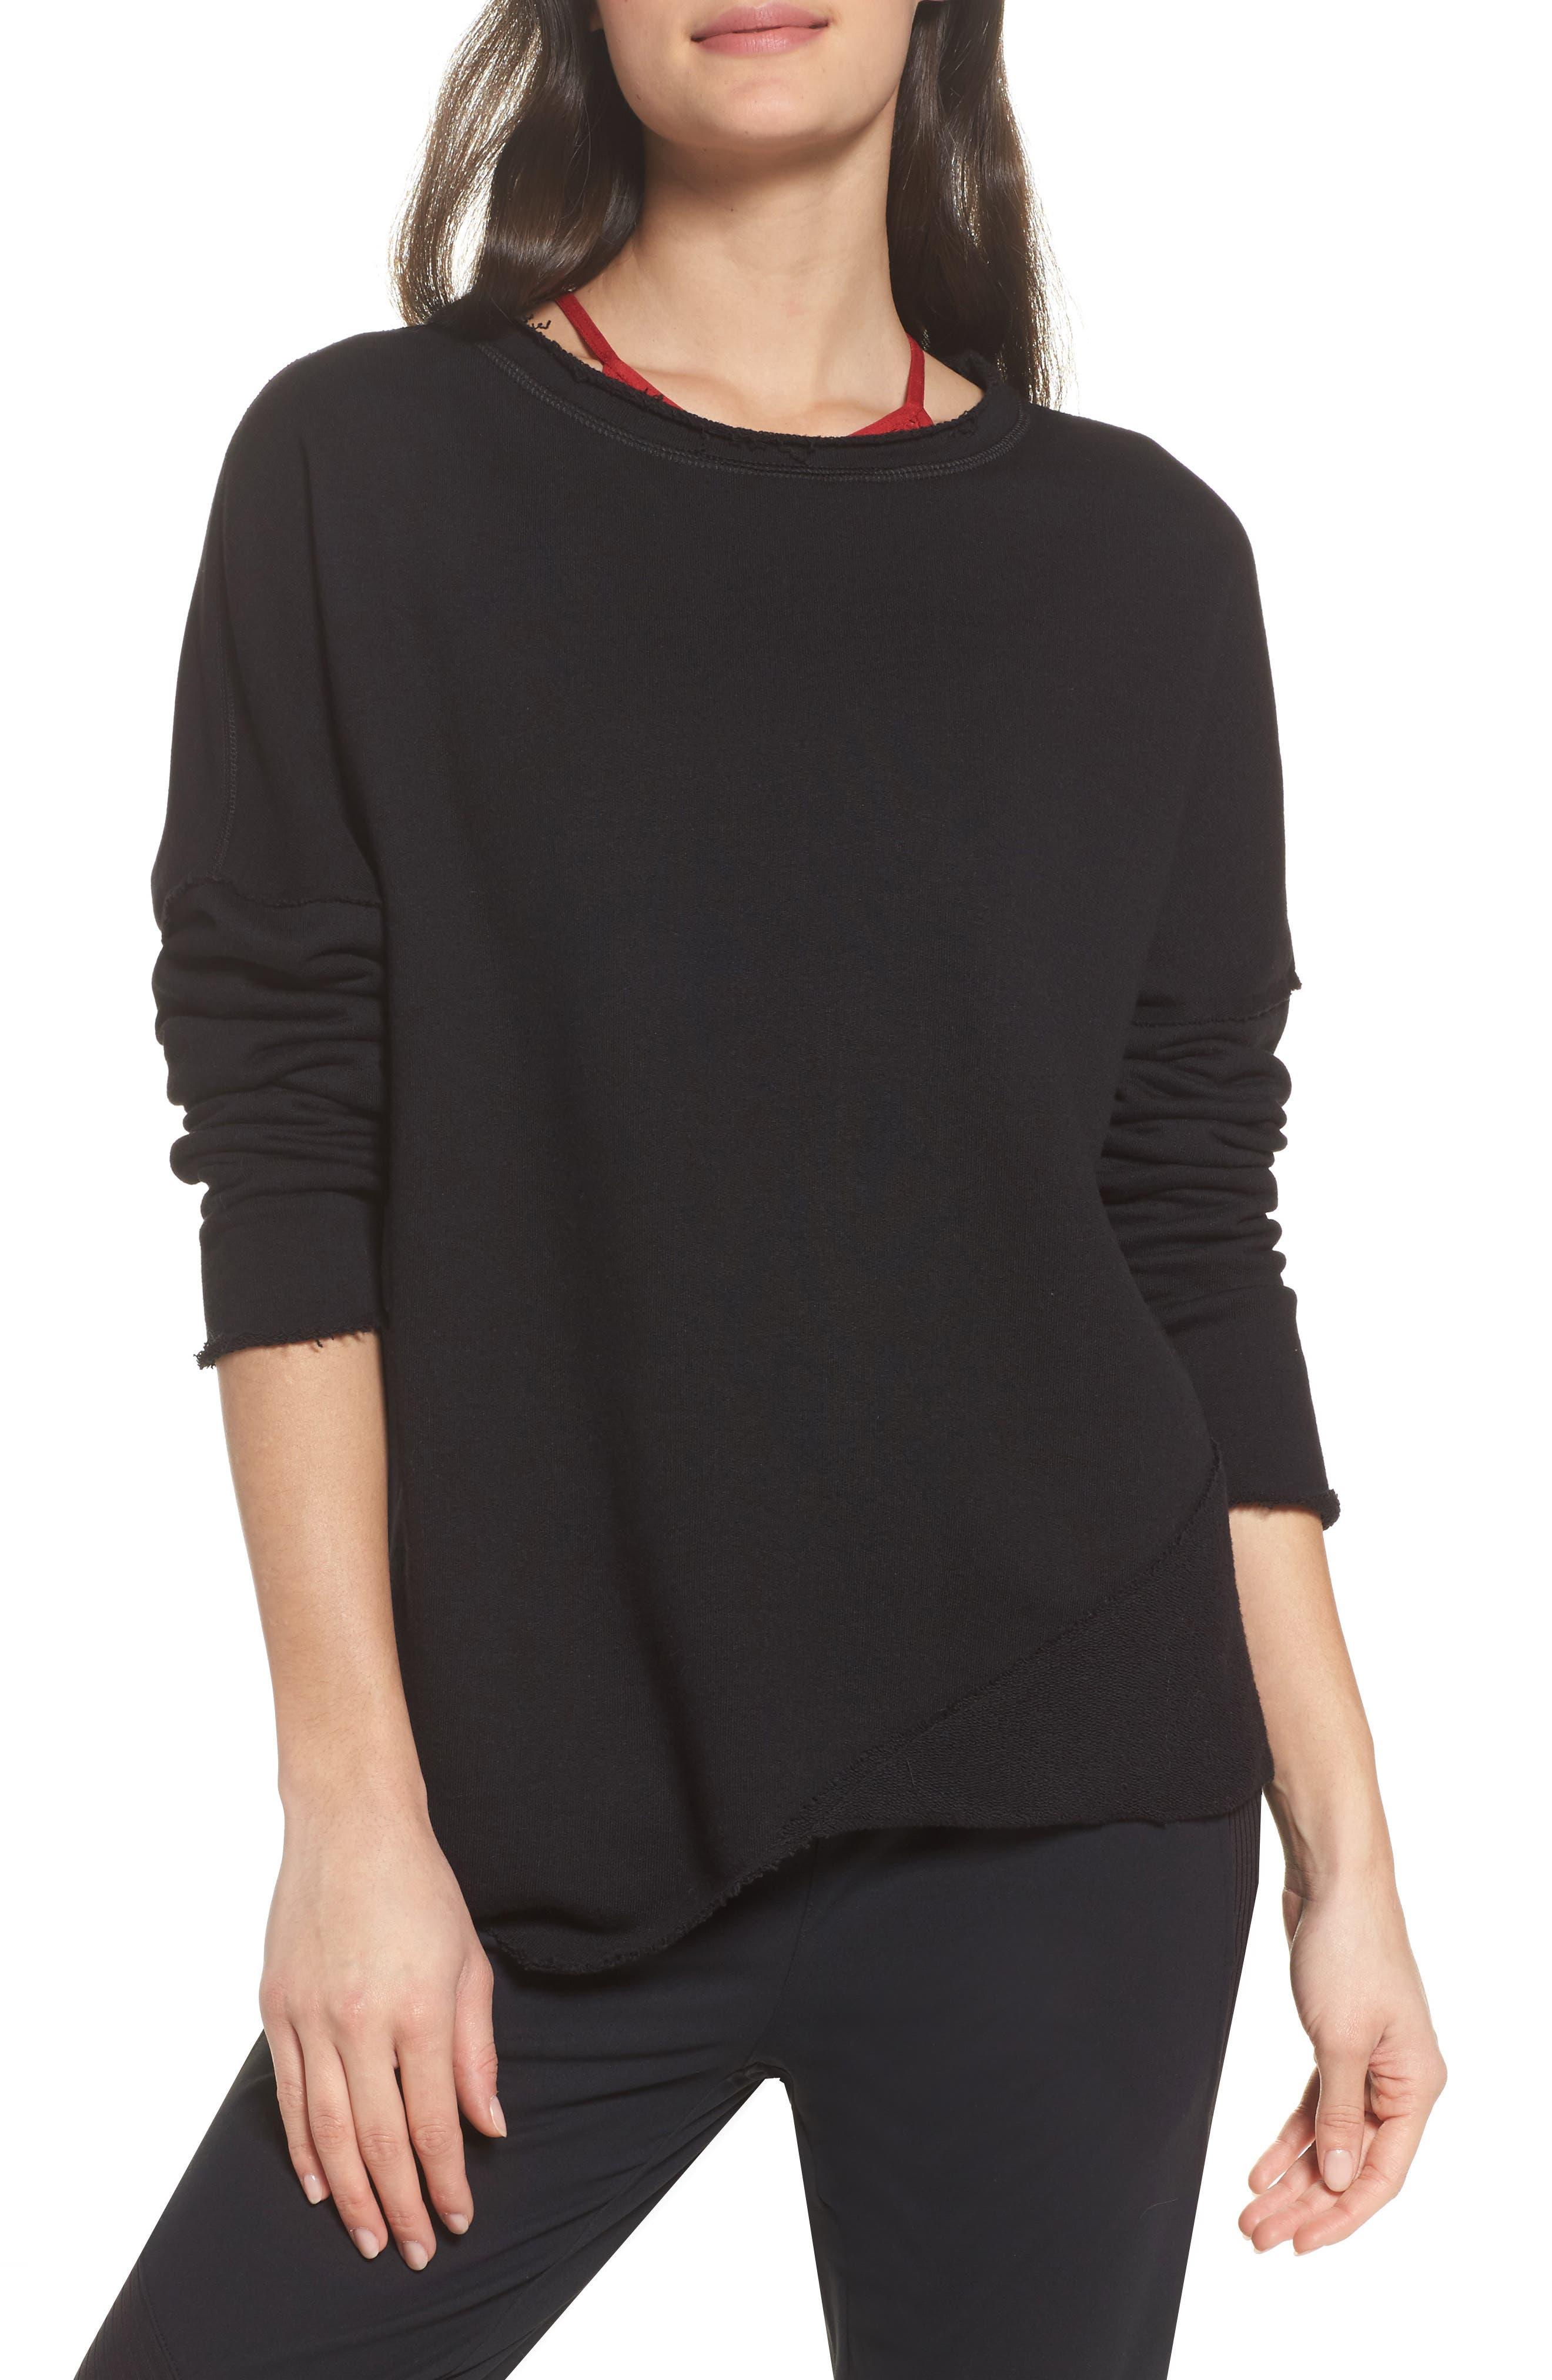 Exhale Sweatshirt,                         Main,                         color, Black